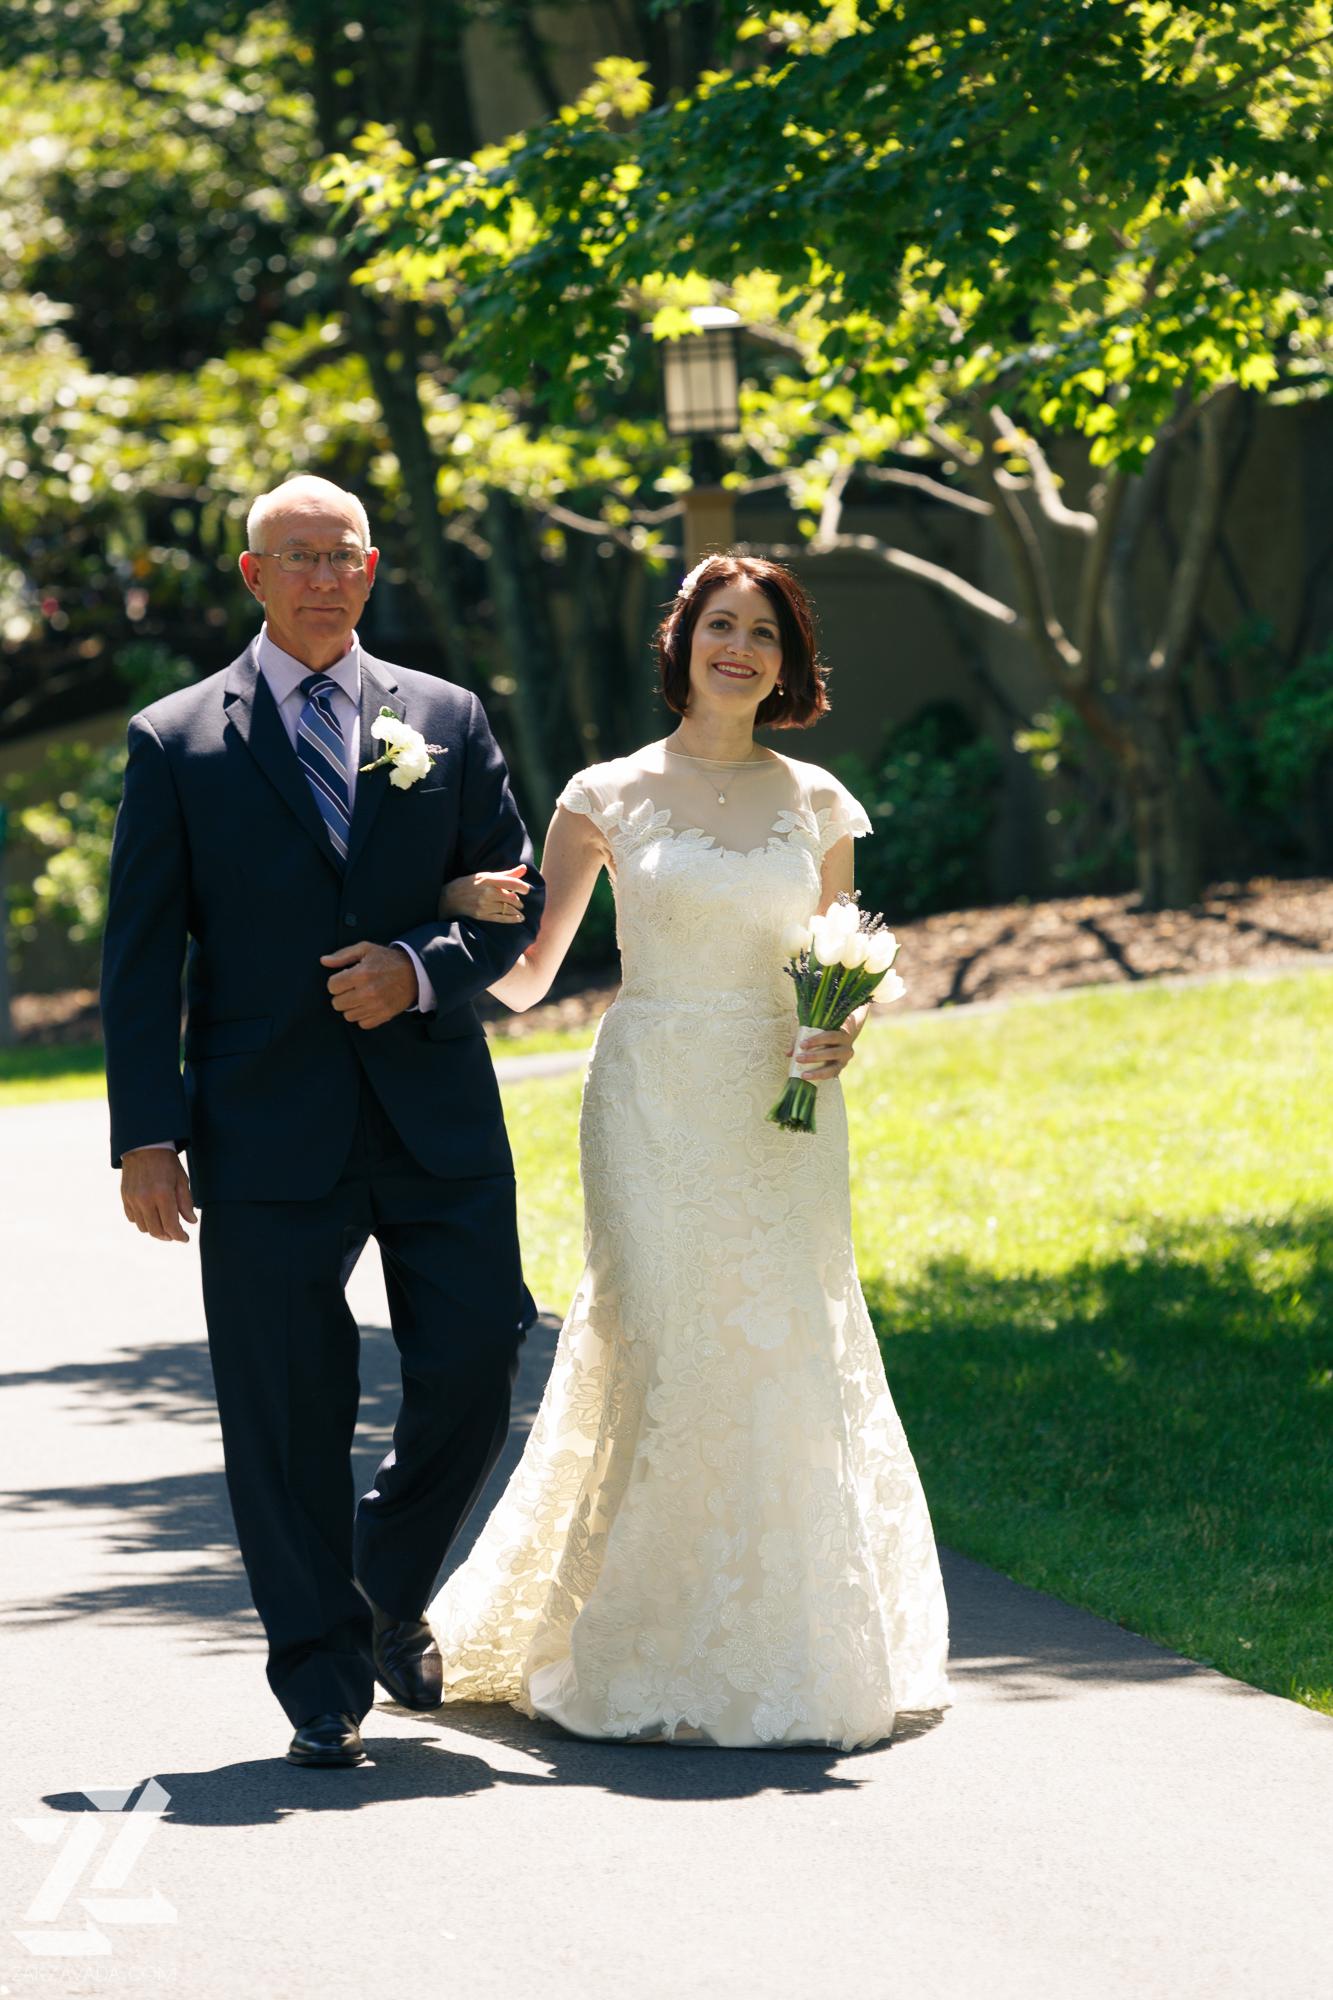 scranton-wedding-photography-zak-zavada-ruddyBelcastroWedding-149.jpg